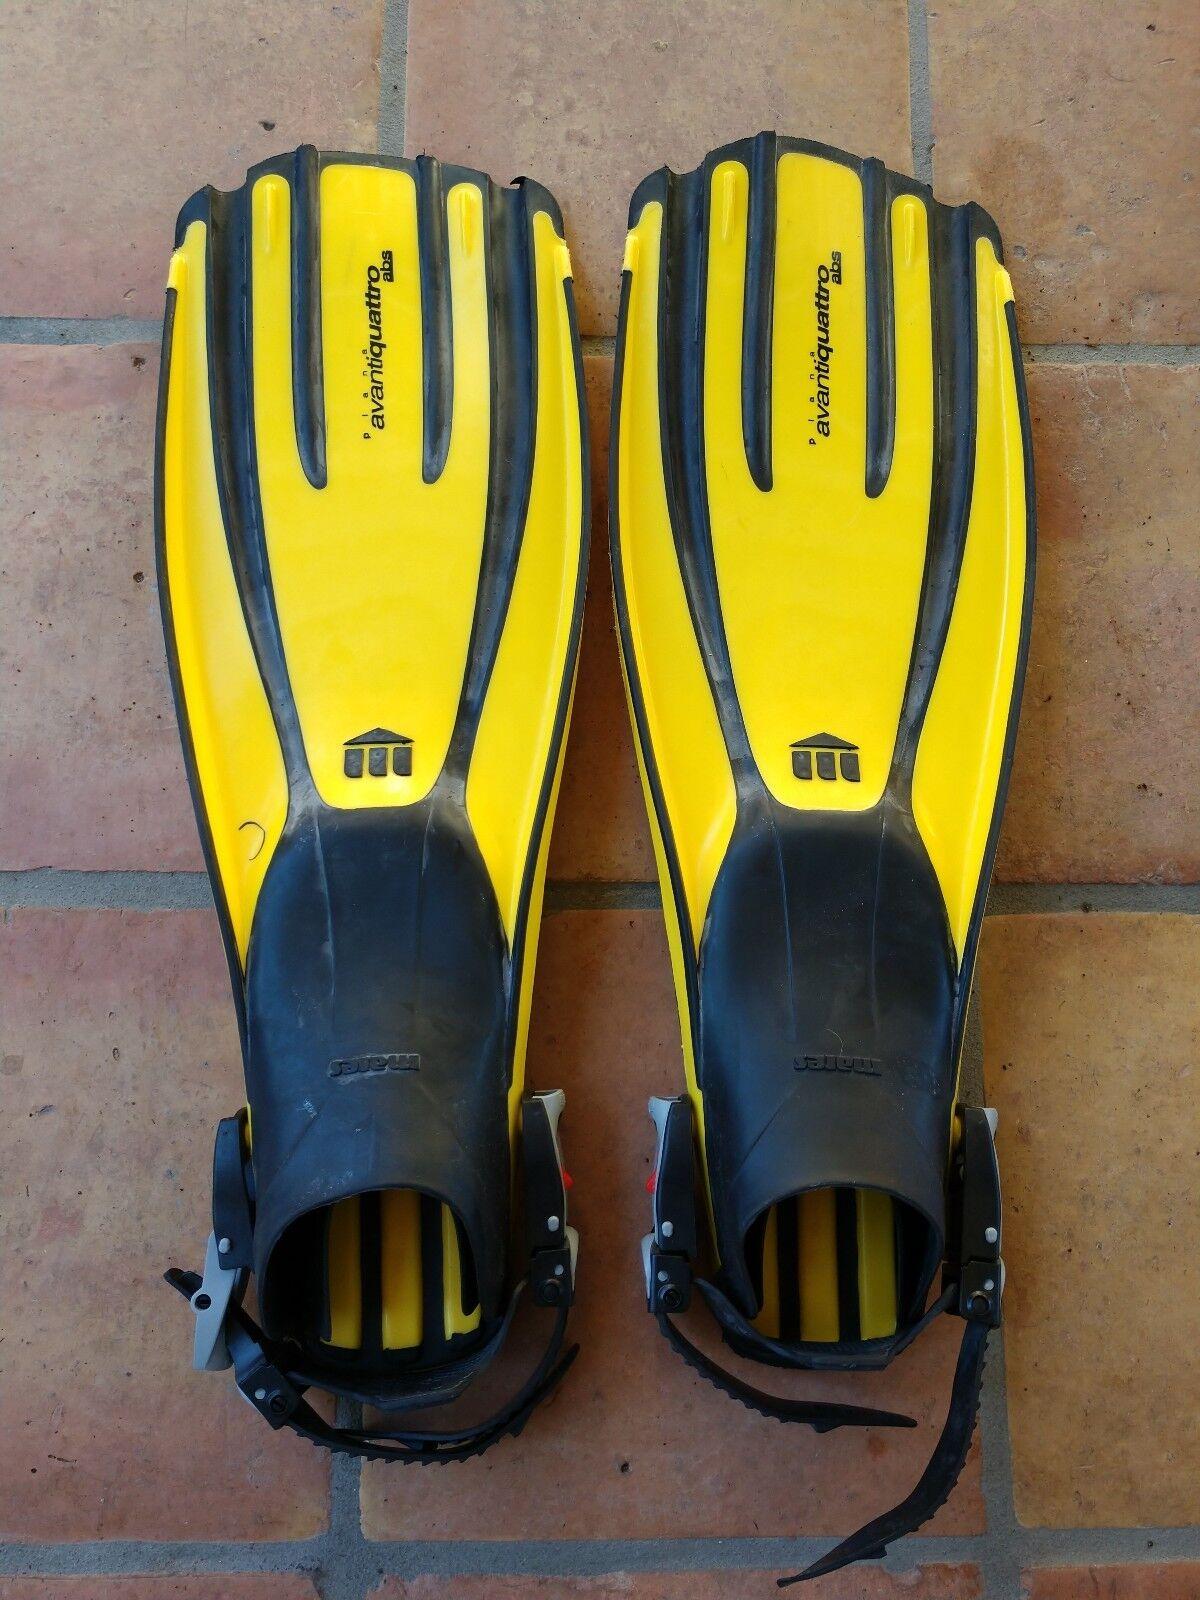 Mares Plana AdvantiQuattro yellow scuba Fins size regular